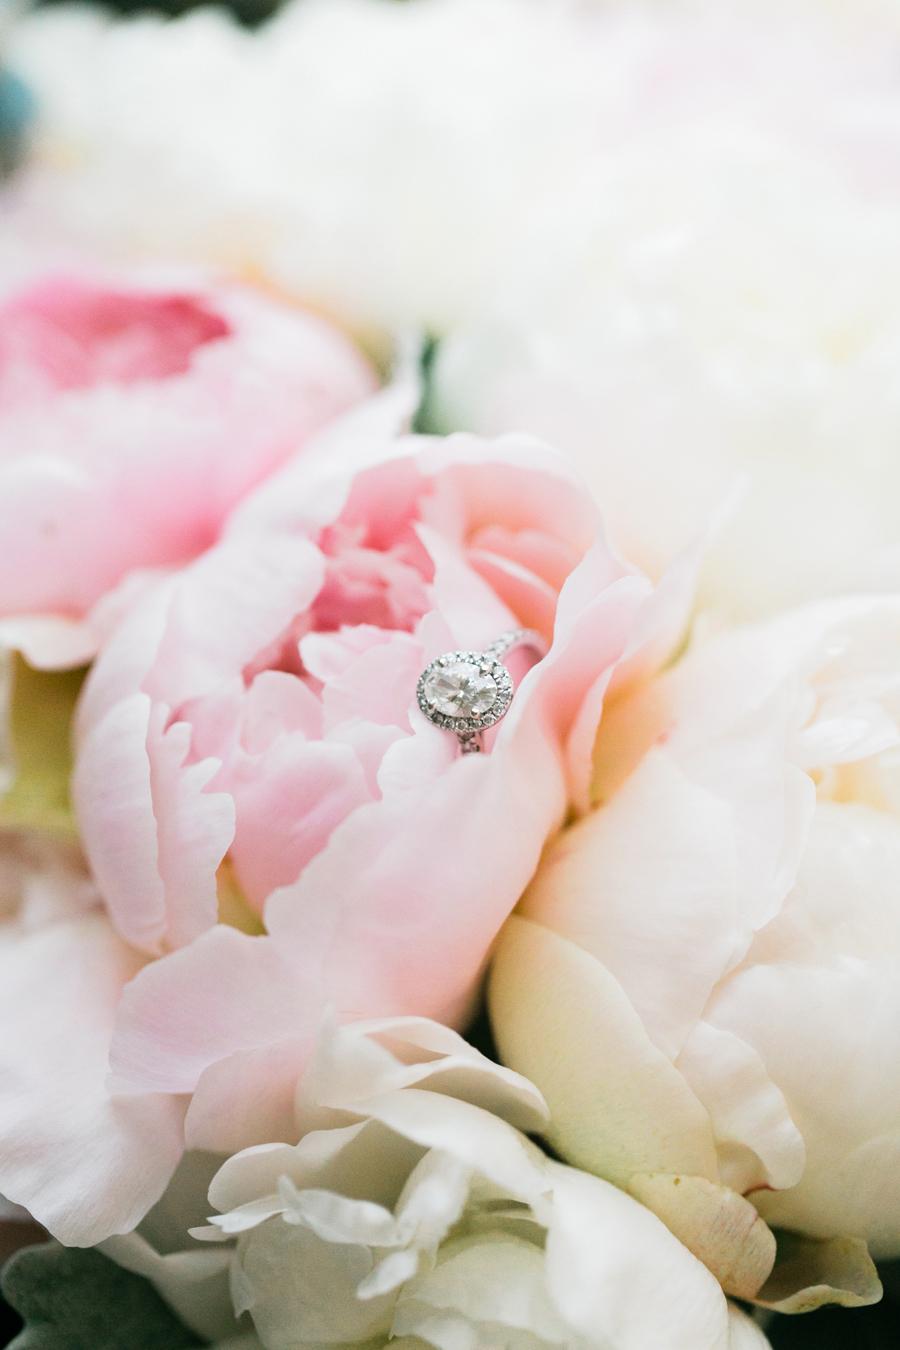 artistrie-co-best-wedding-photos-2015-006